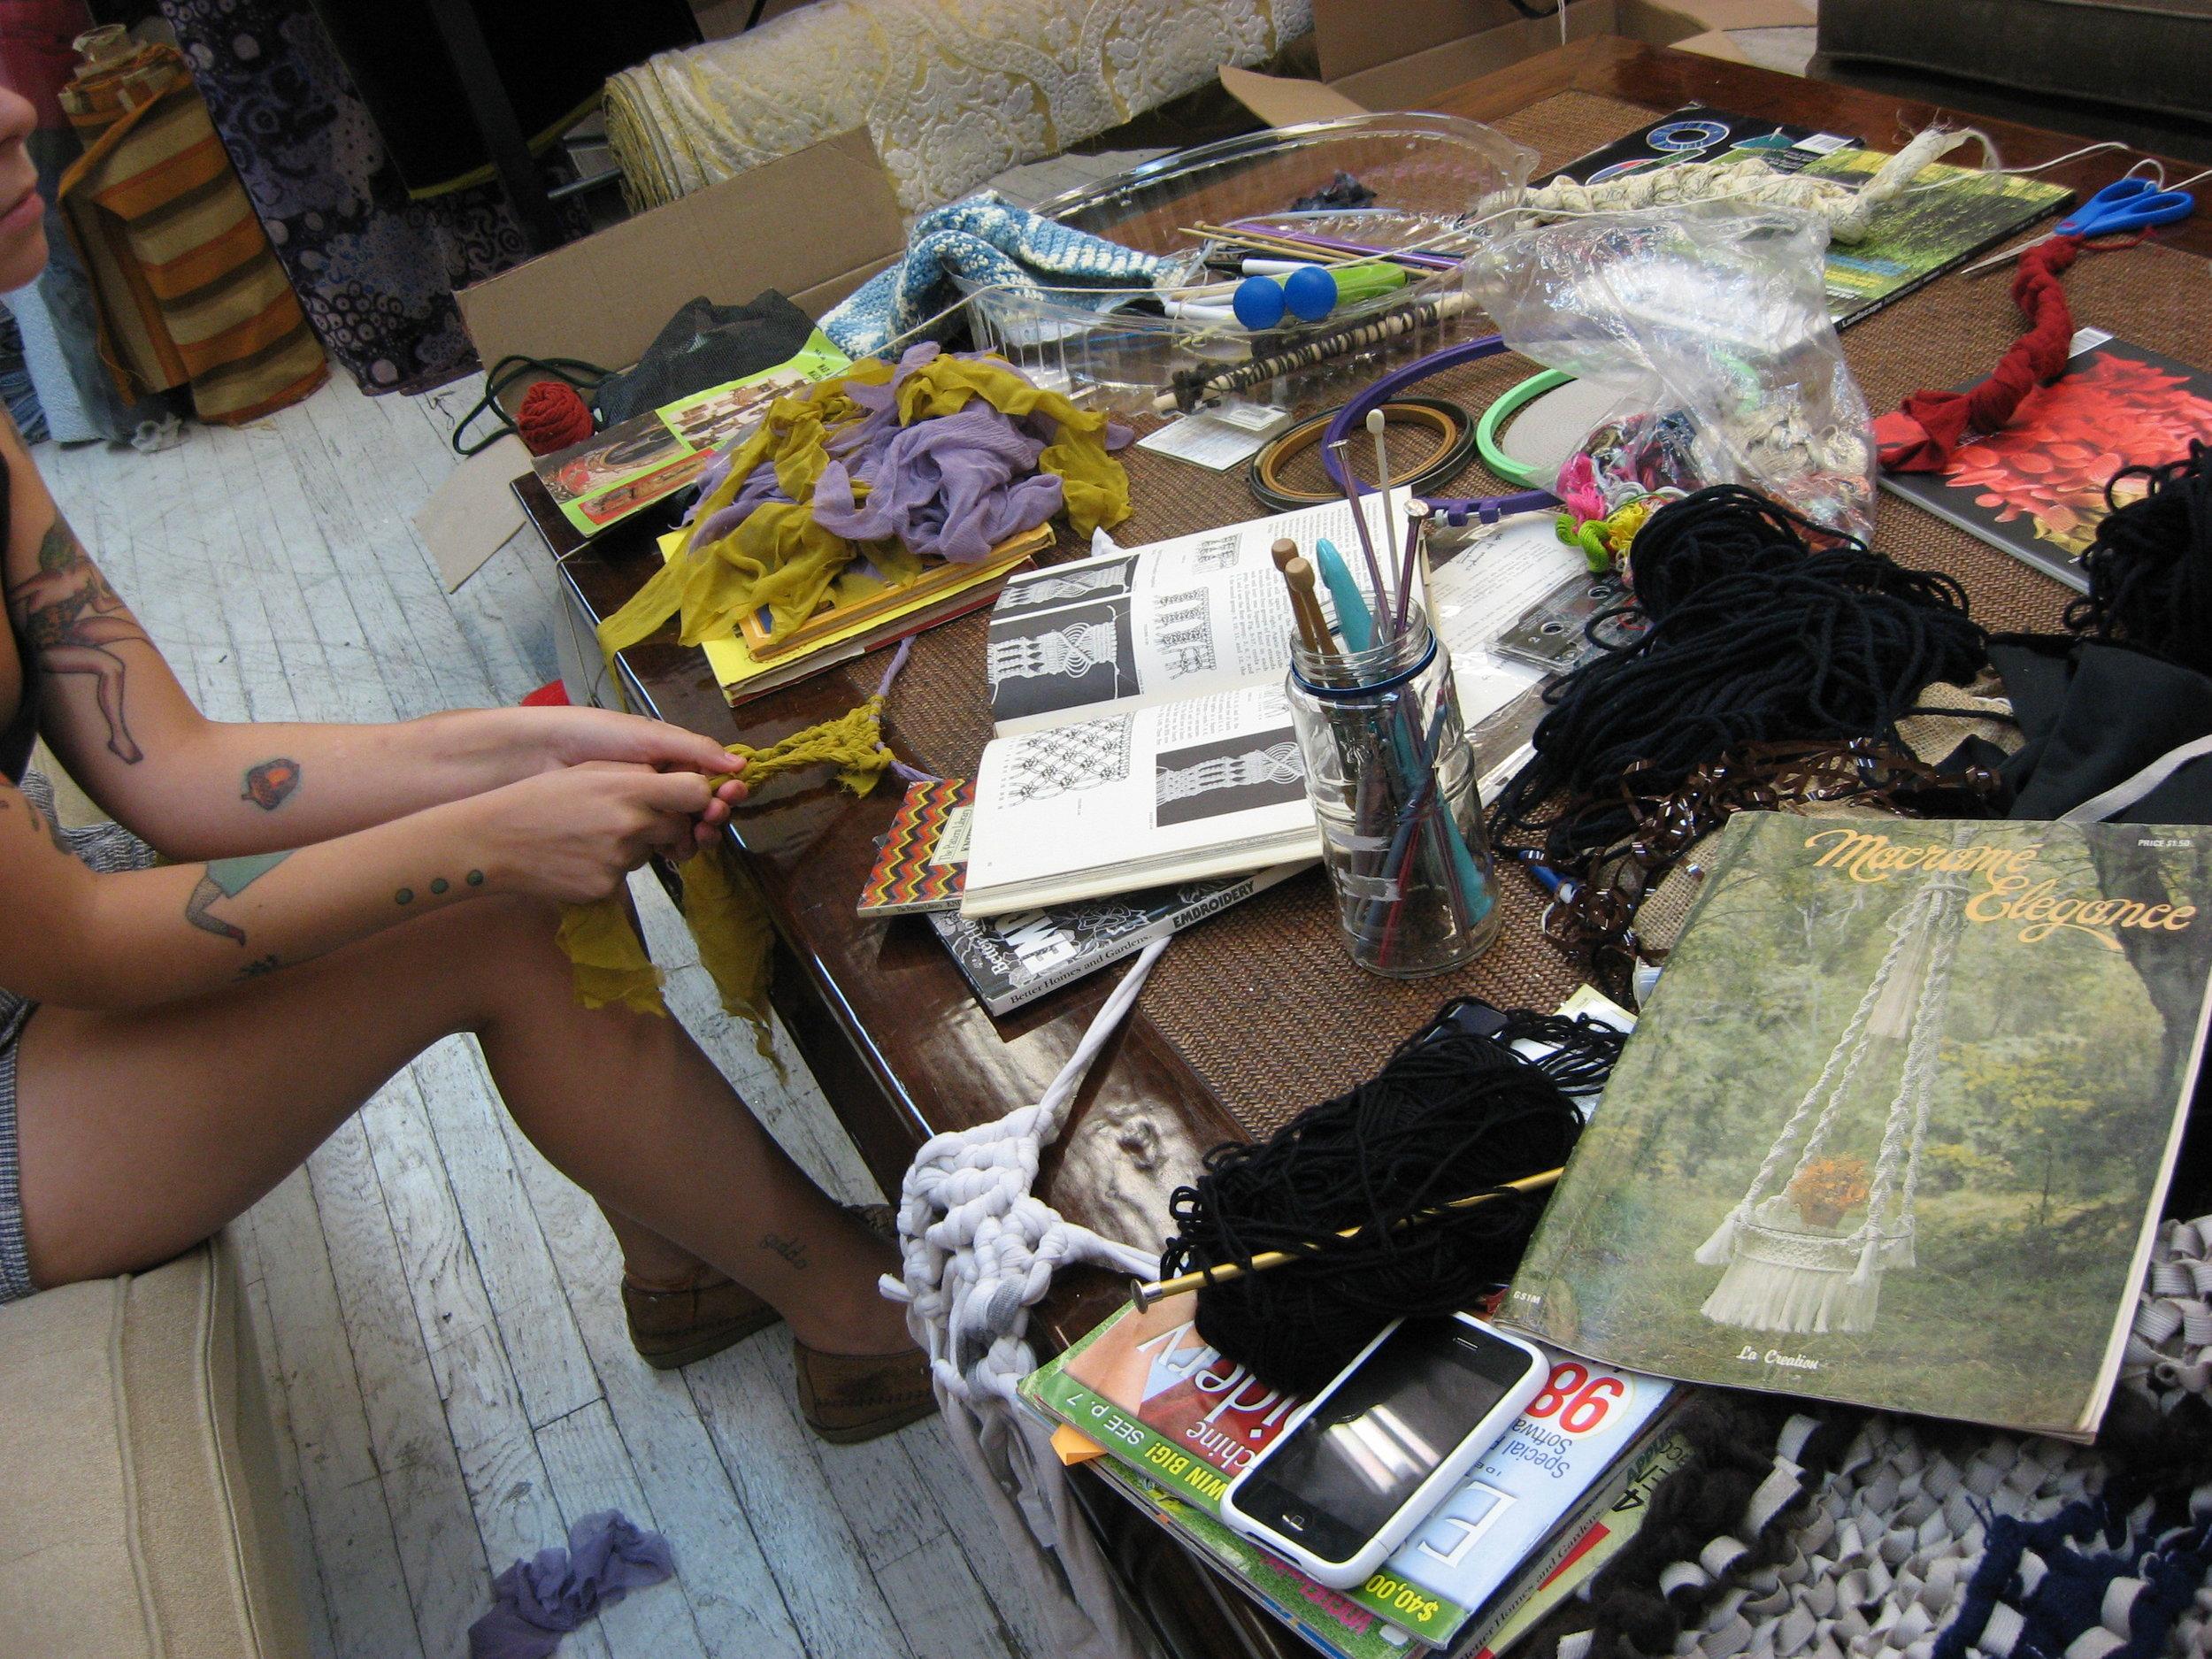 knitting-and-knotting-table_4942873483_o.jpg